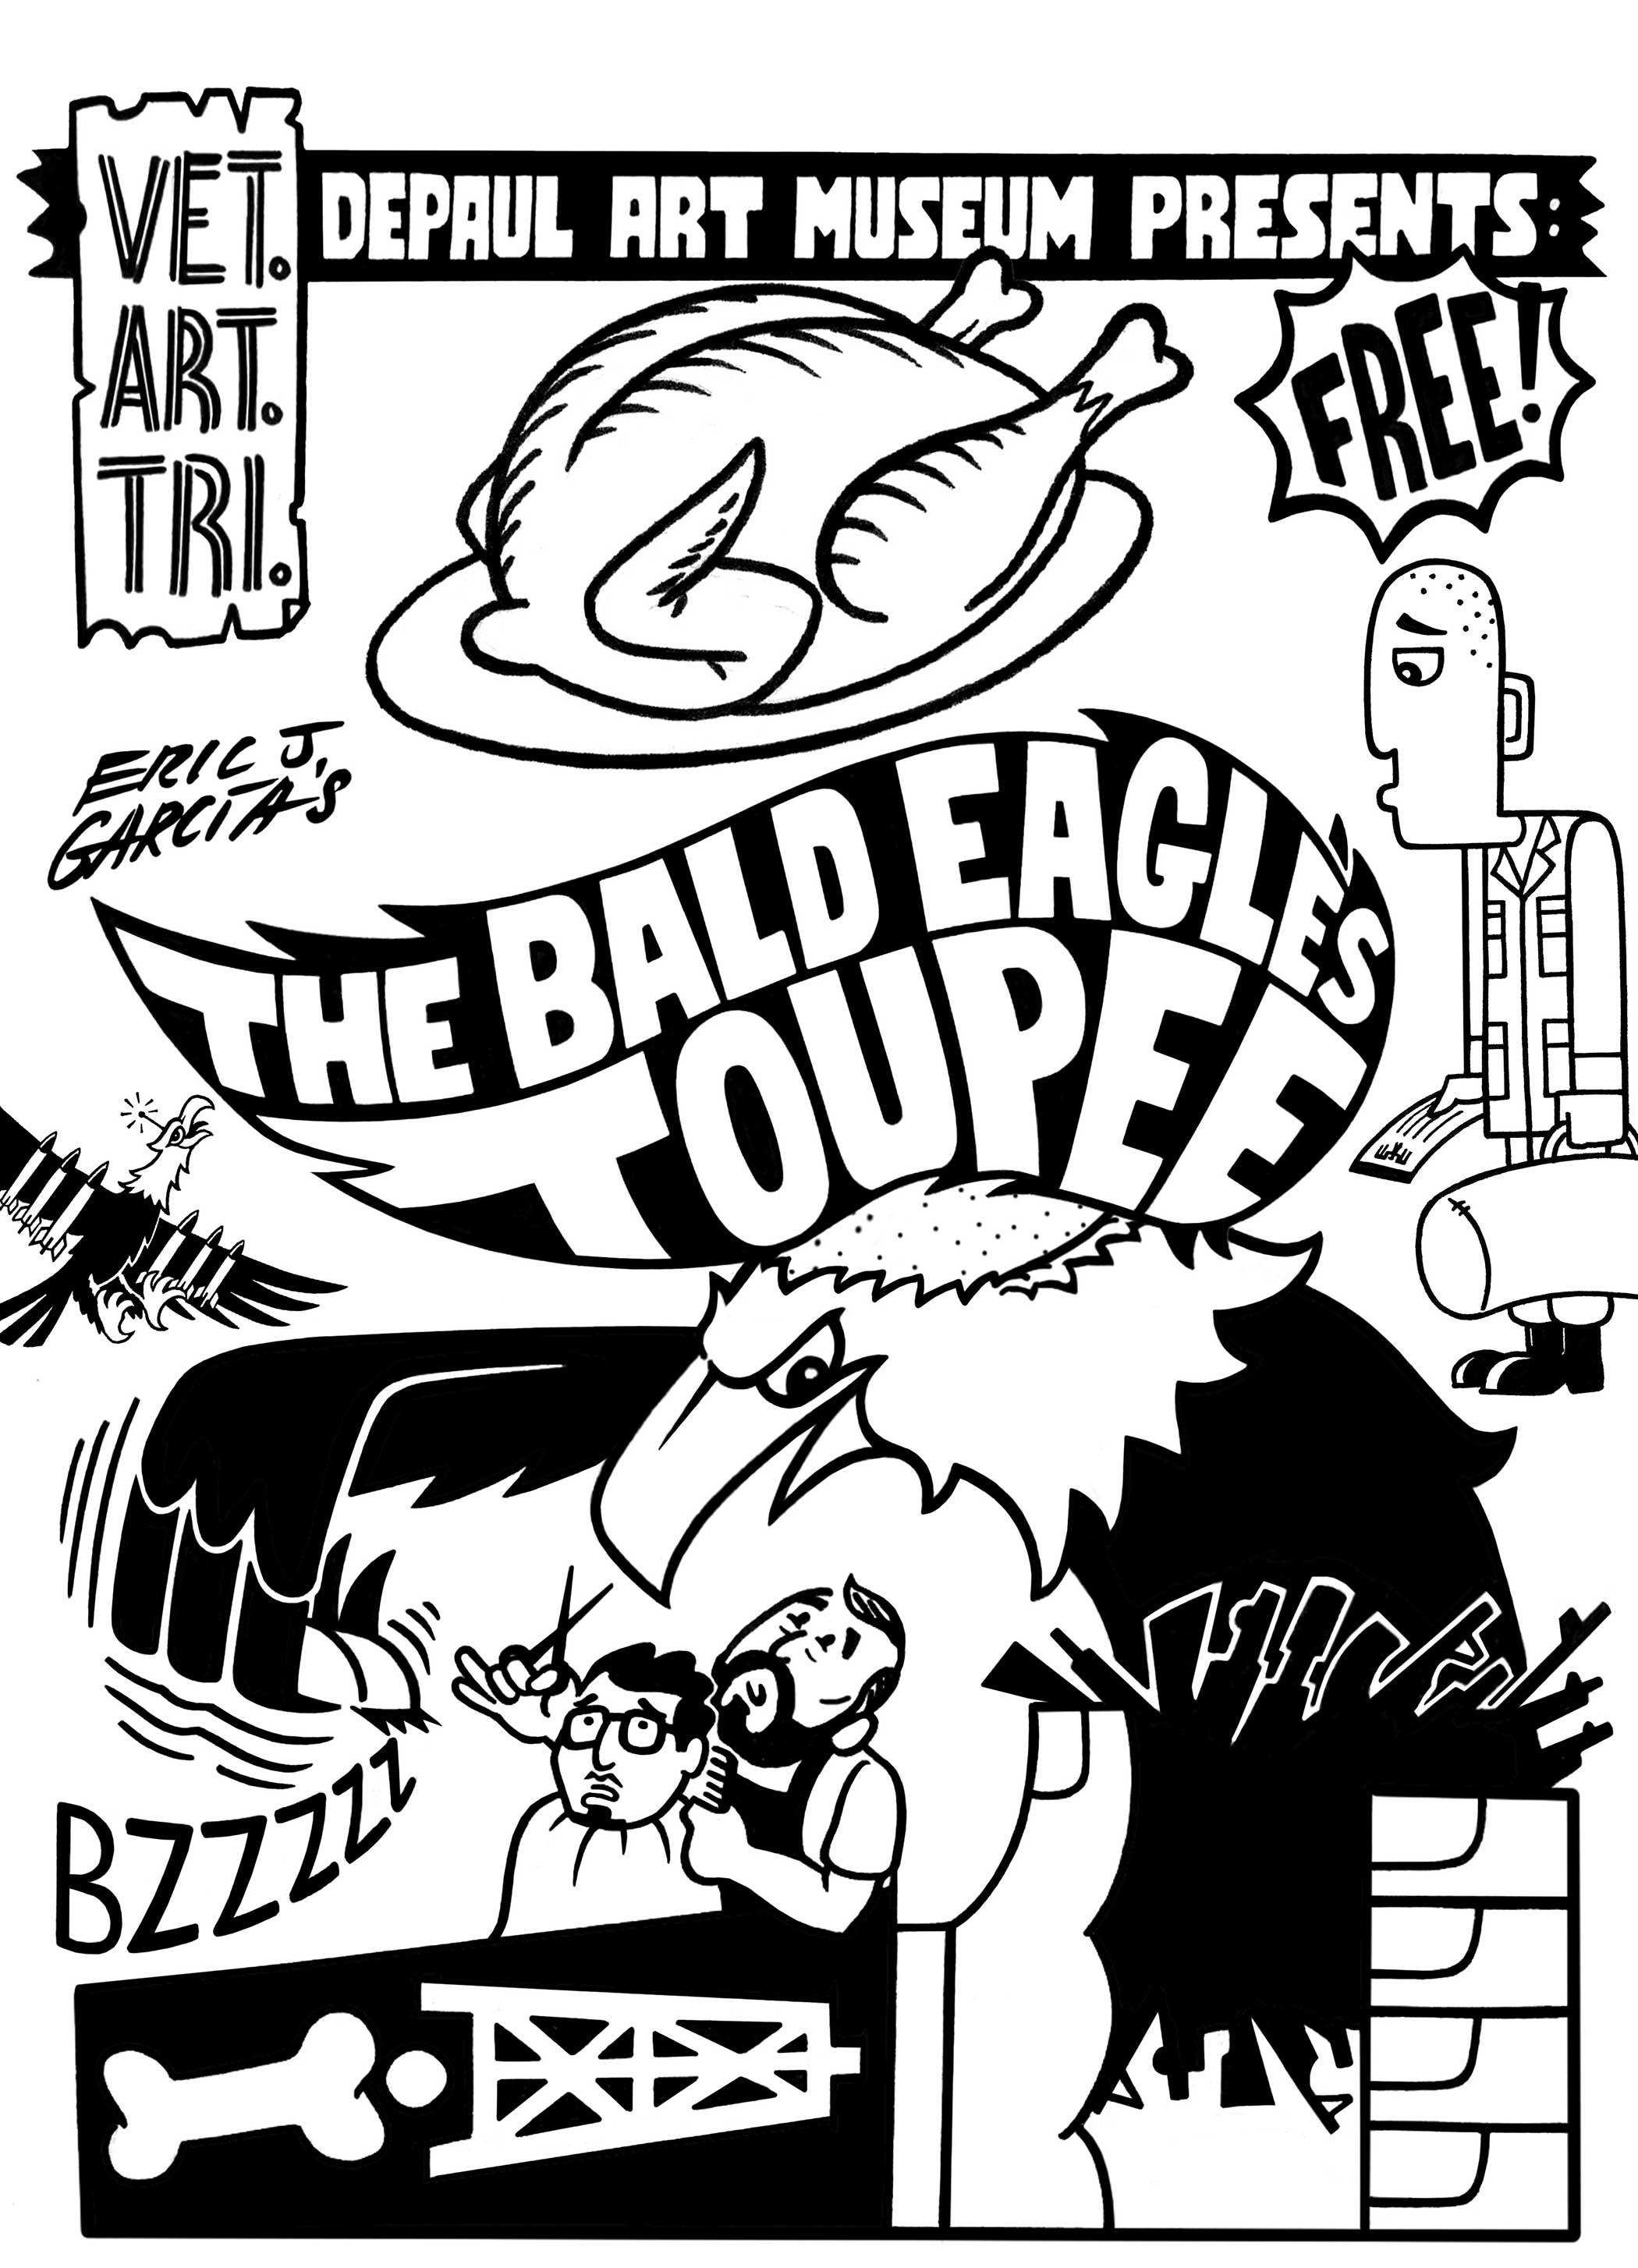 Eric J. Garcia,  The Bald Eagle's Toupee  takeaway at DePaul Art Museum, 2019.